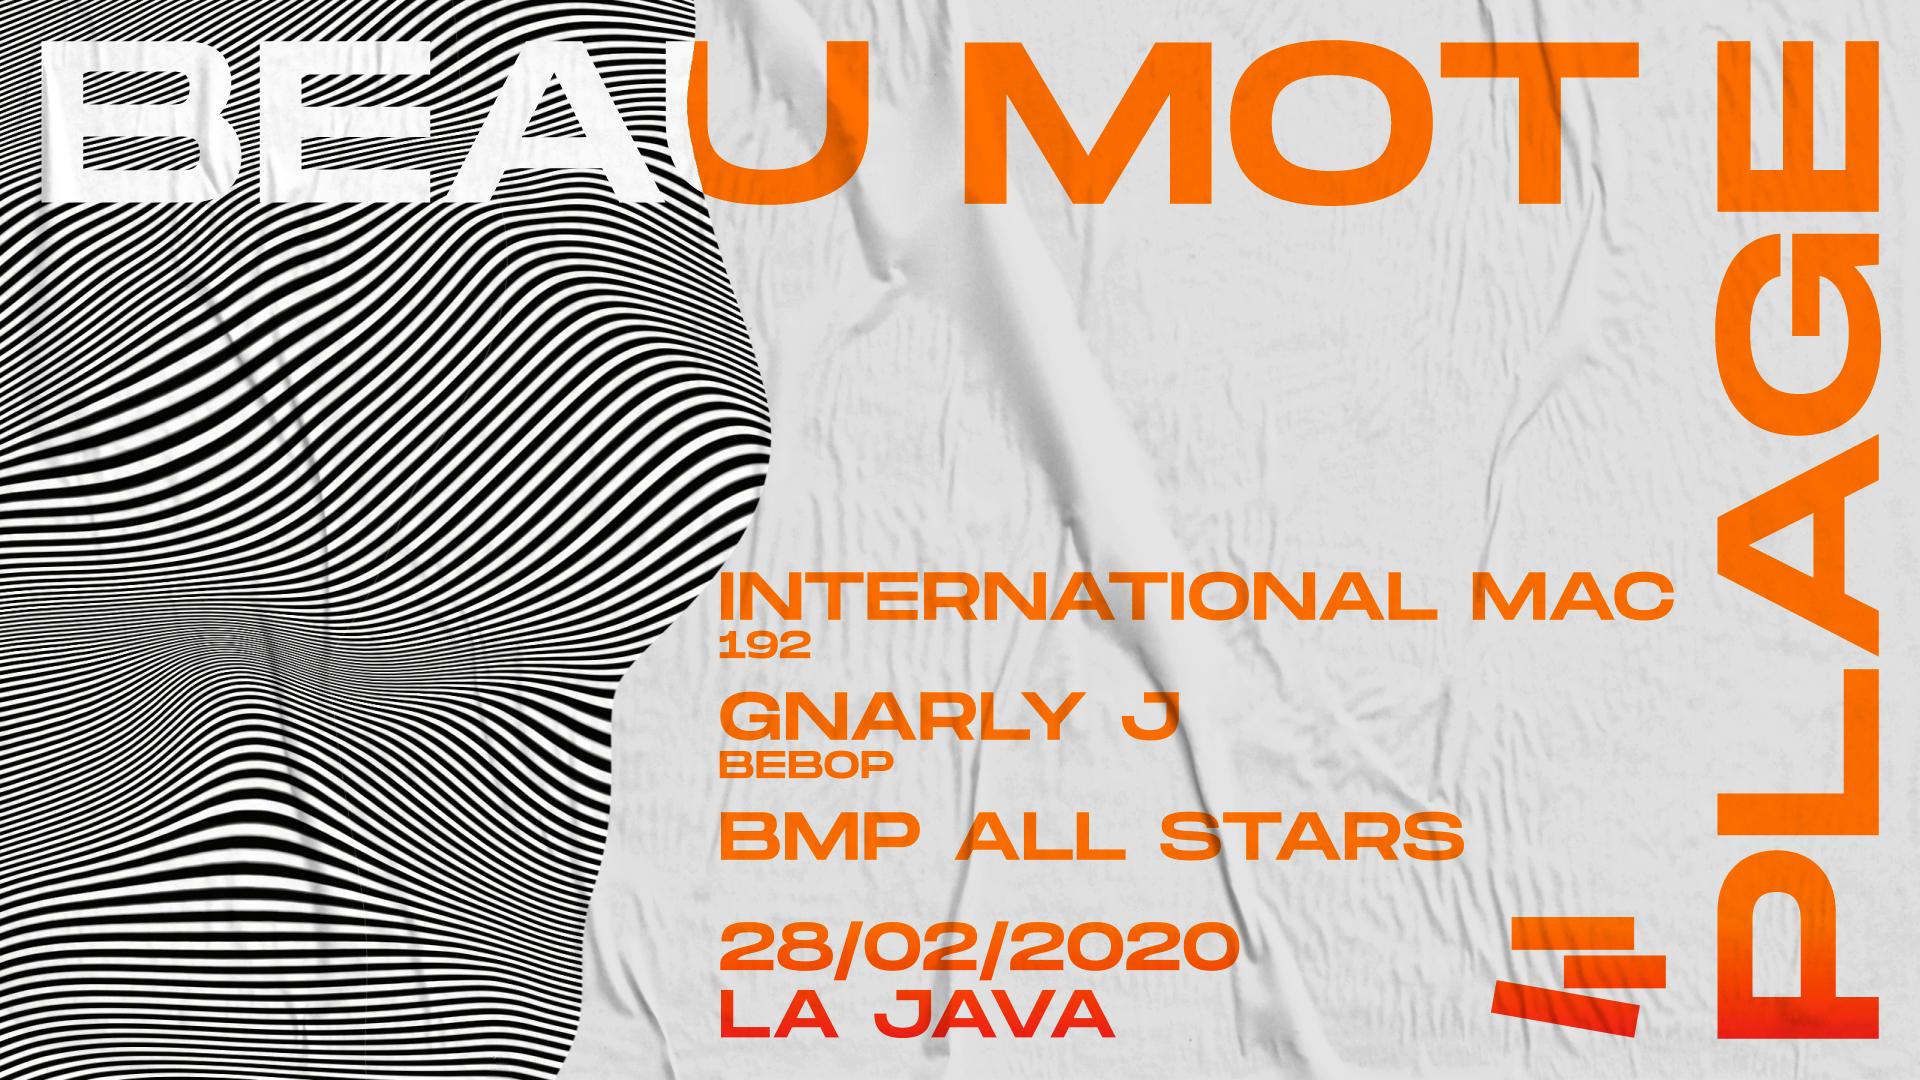 Beau Mot Plage invite International Mac & Gnarly J